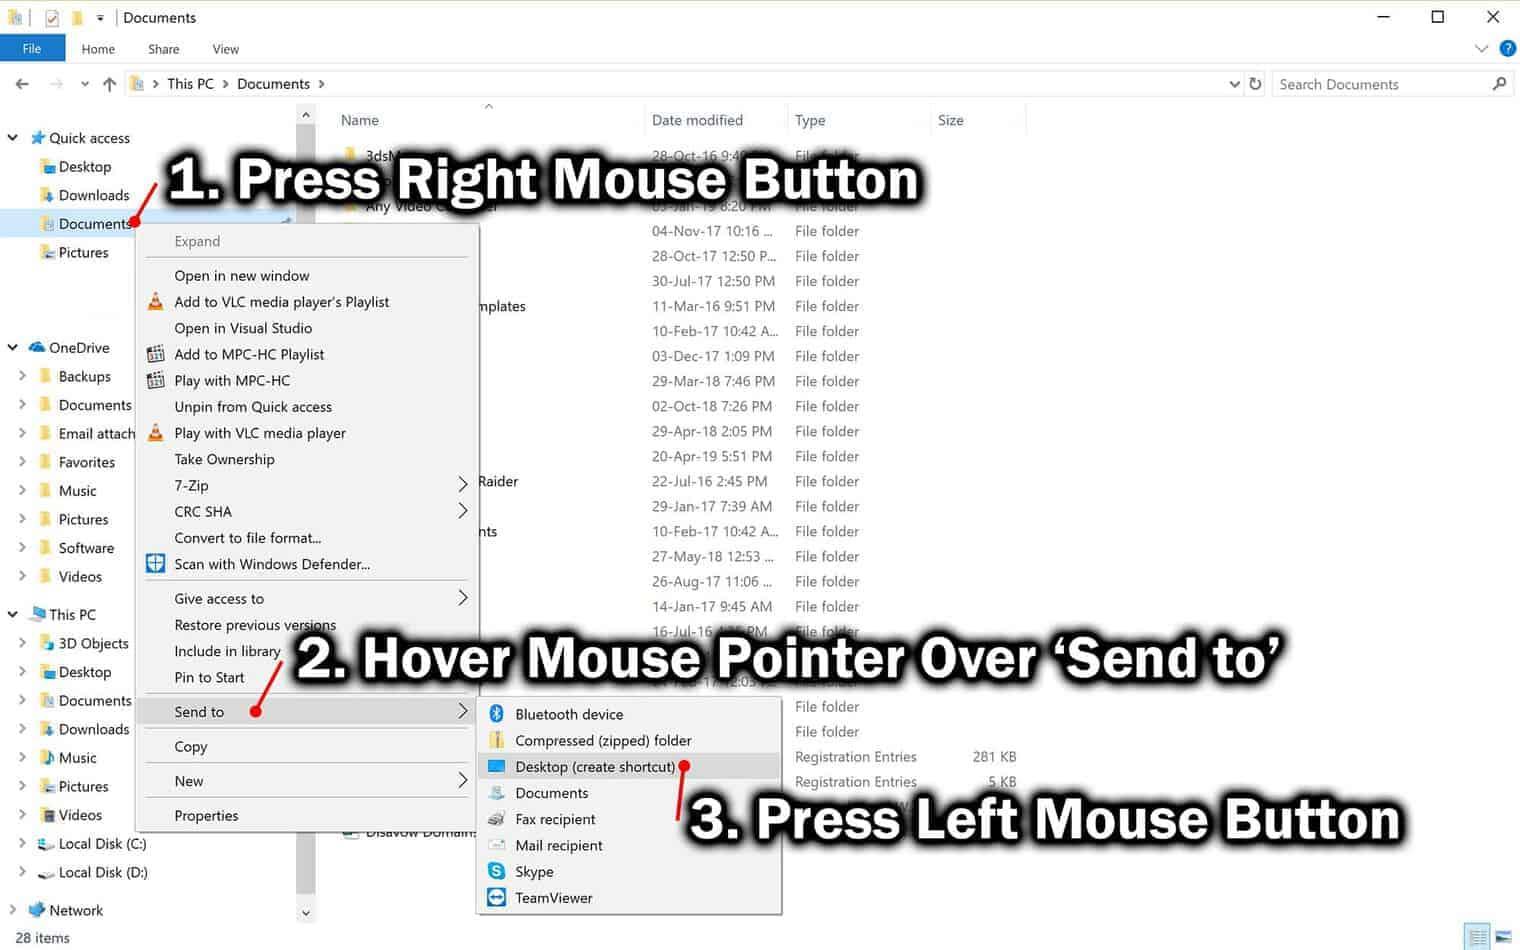 create shortcut in windows file explorer